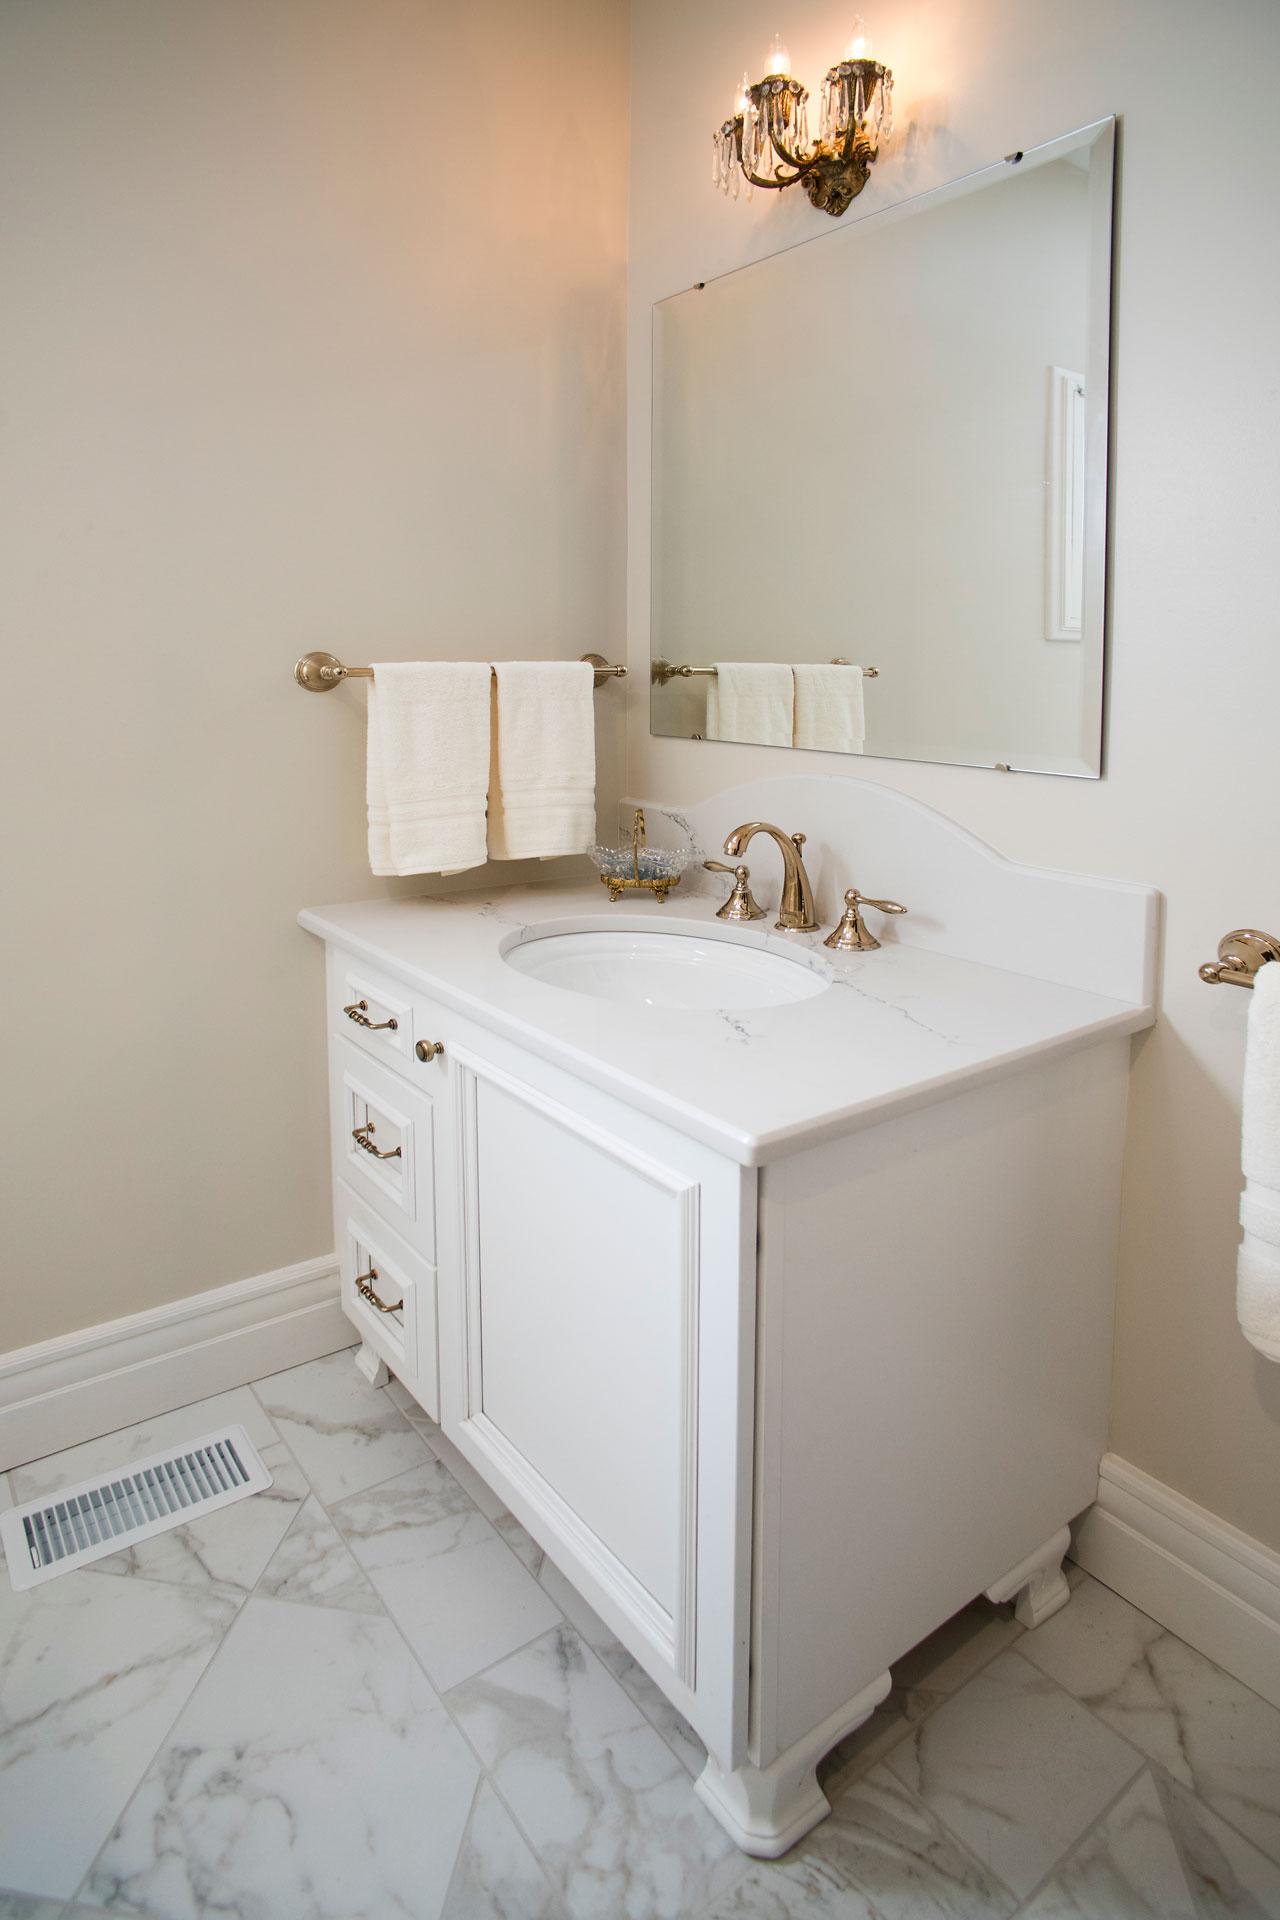 Master Bathroom Vanity Dressing Room Remodel Roeser Home Remodeling